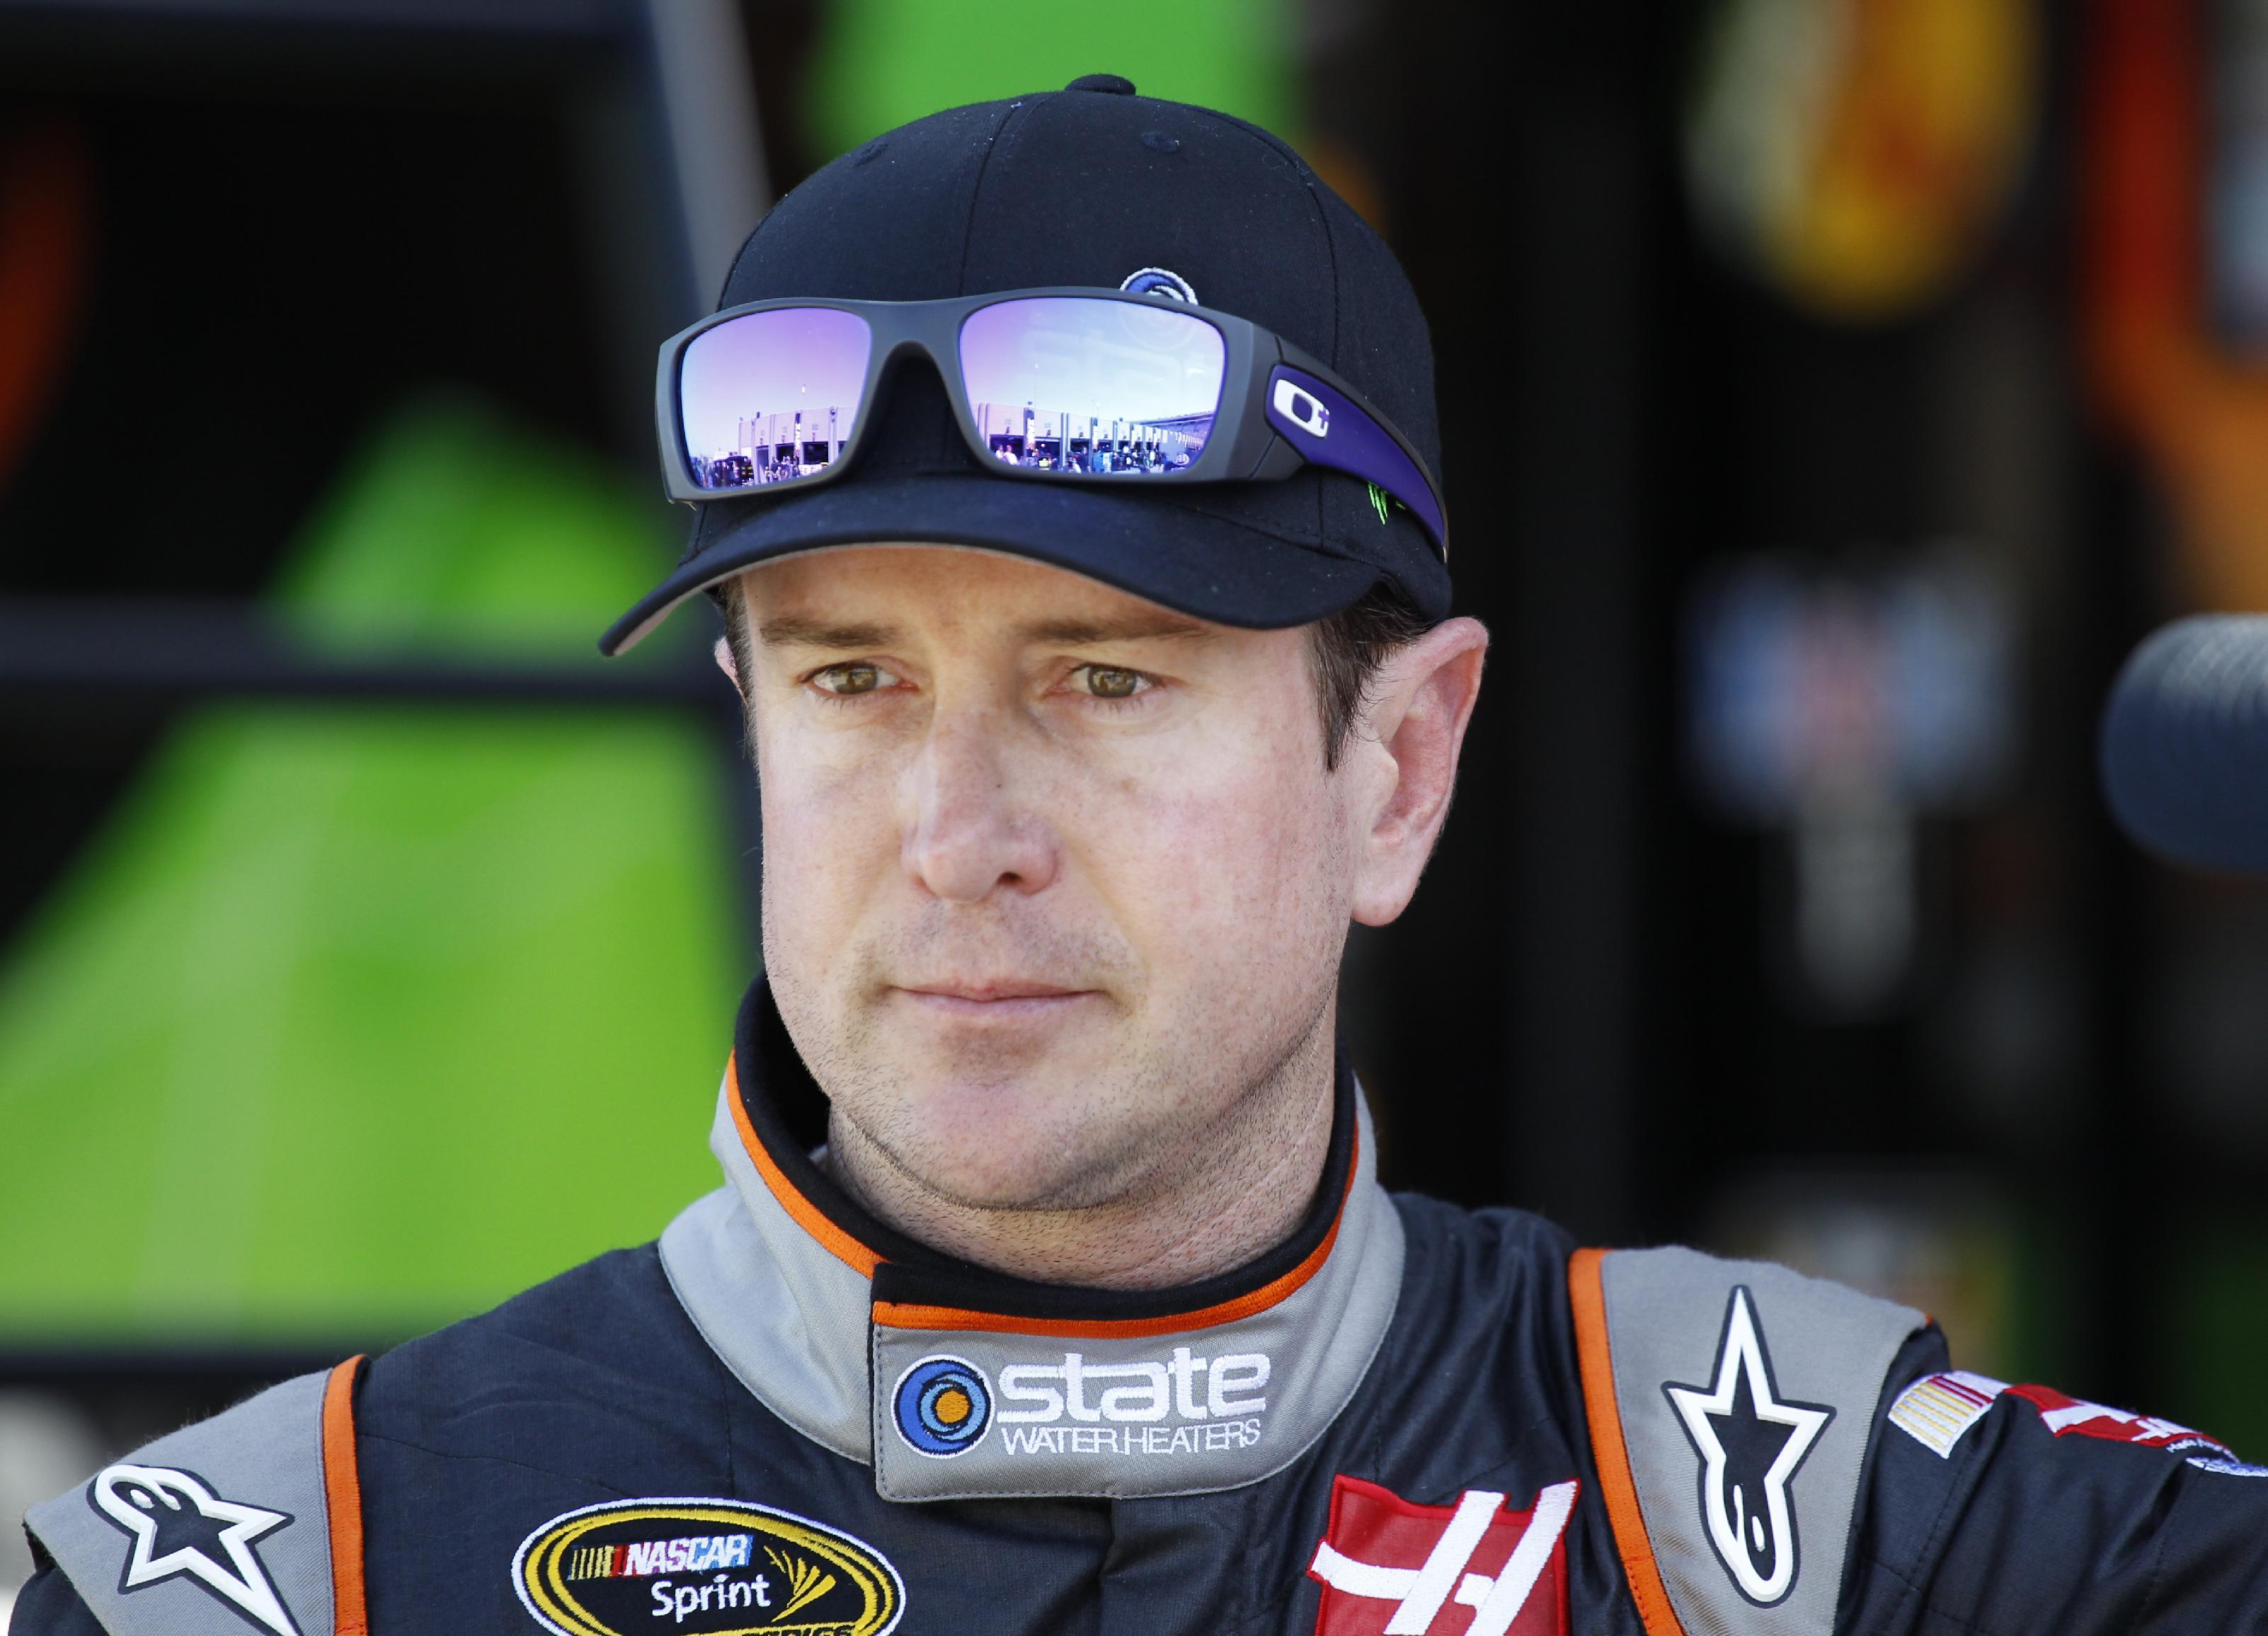 Kurt Busch missed three races before being reinstated on Wednesday. (AP)